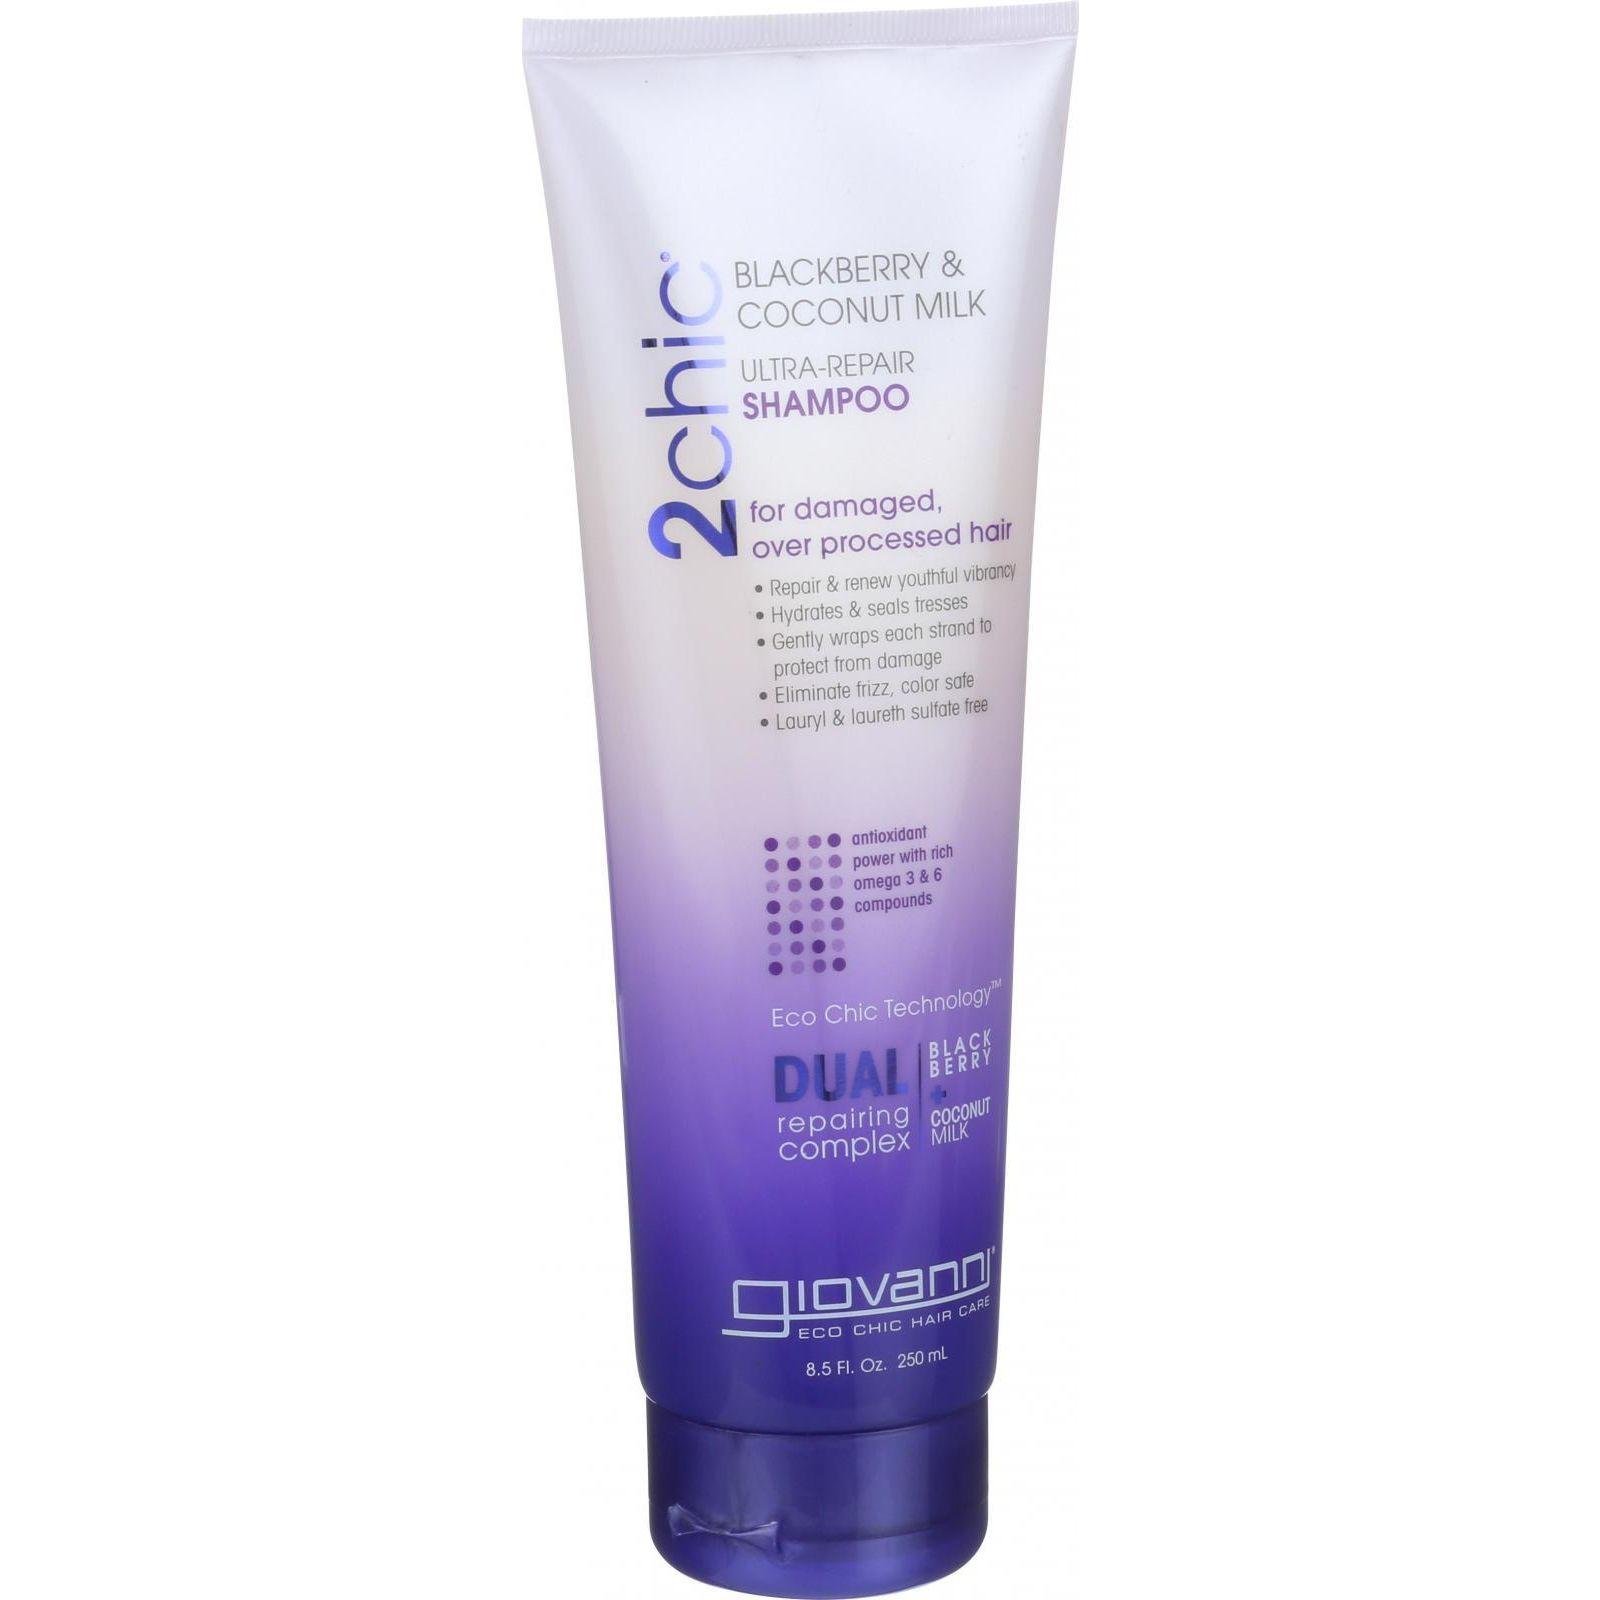 Giovanni Shampoo - 2chic - Ultra Repair - Blackberry and ...